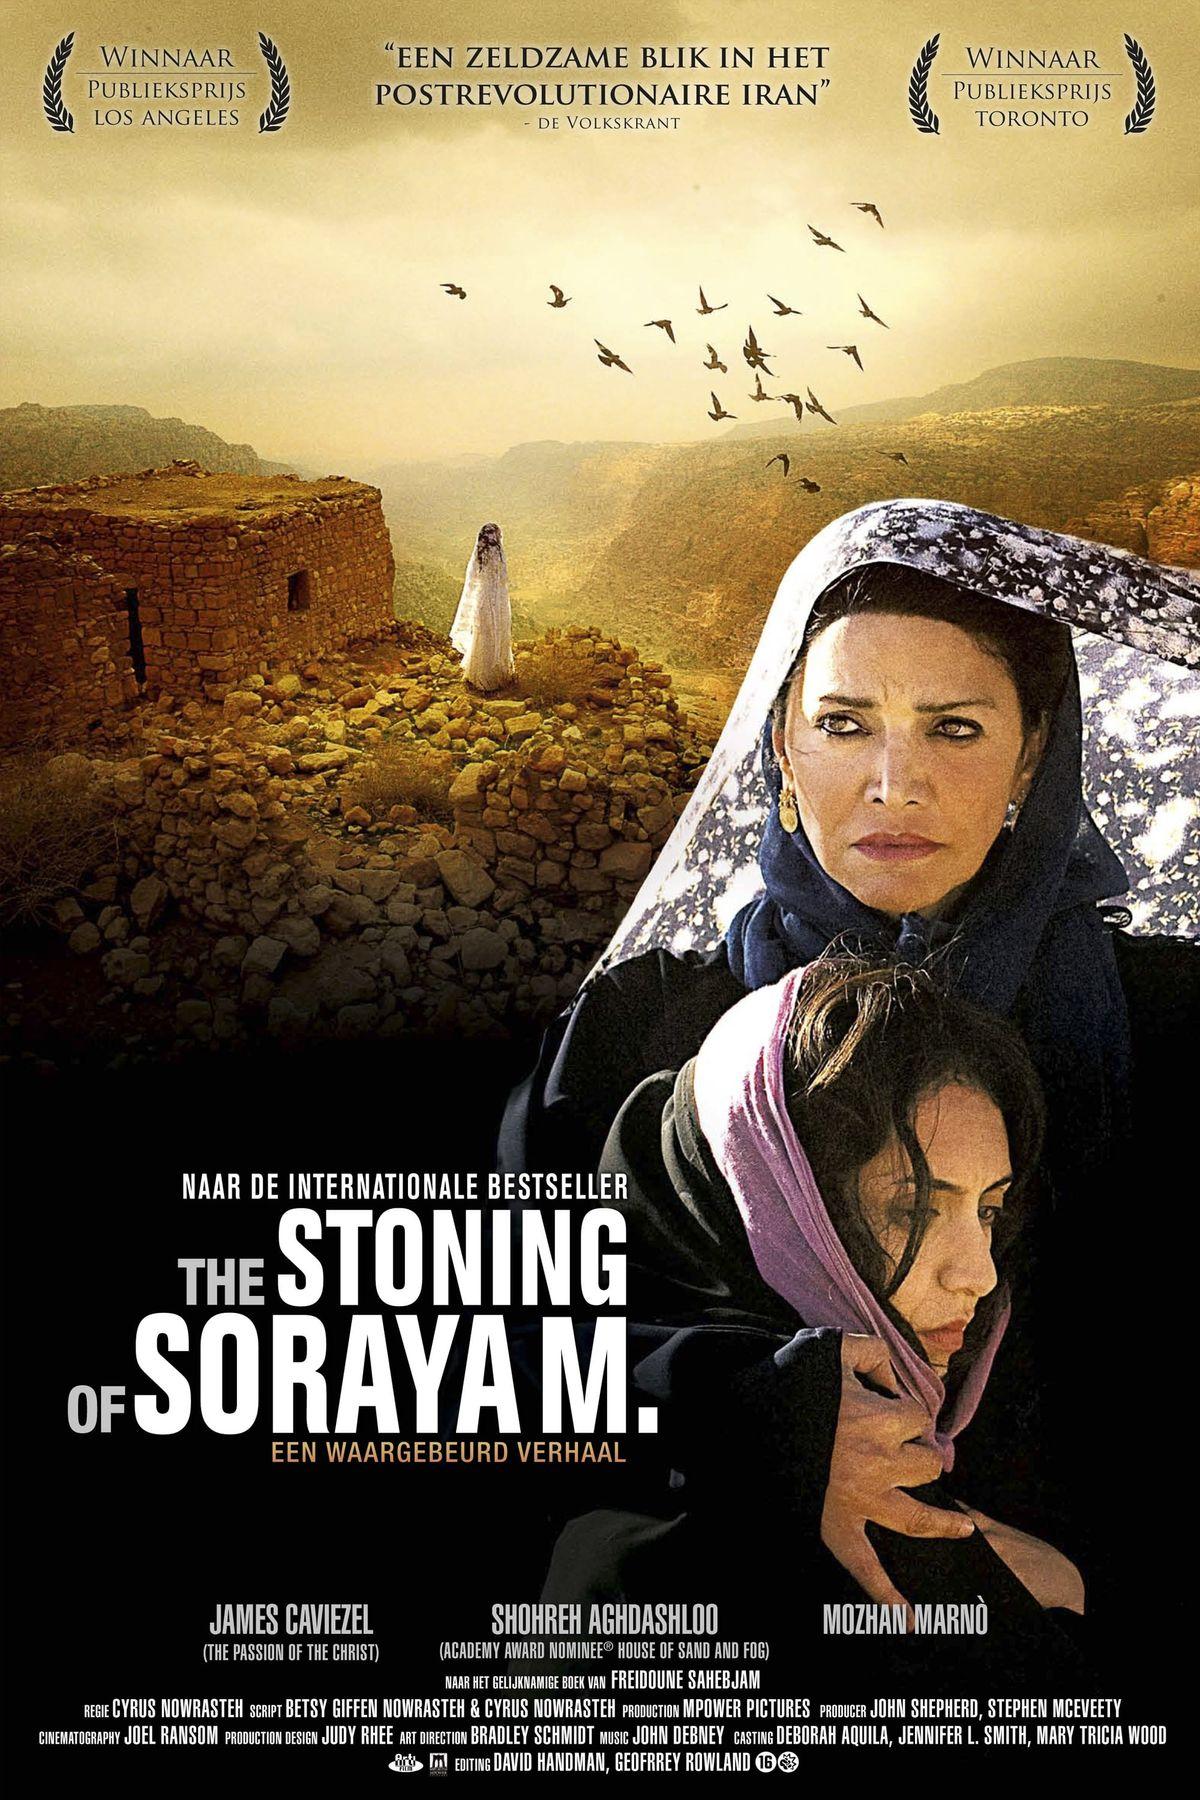 Vida Ghahremani Best Movies, TV Shows and Web Series List